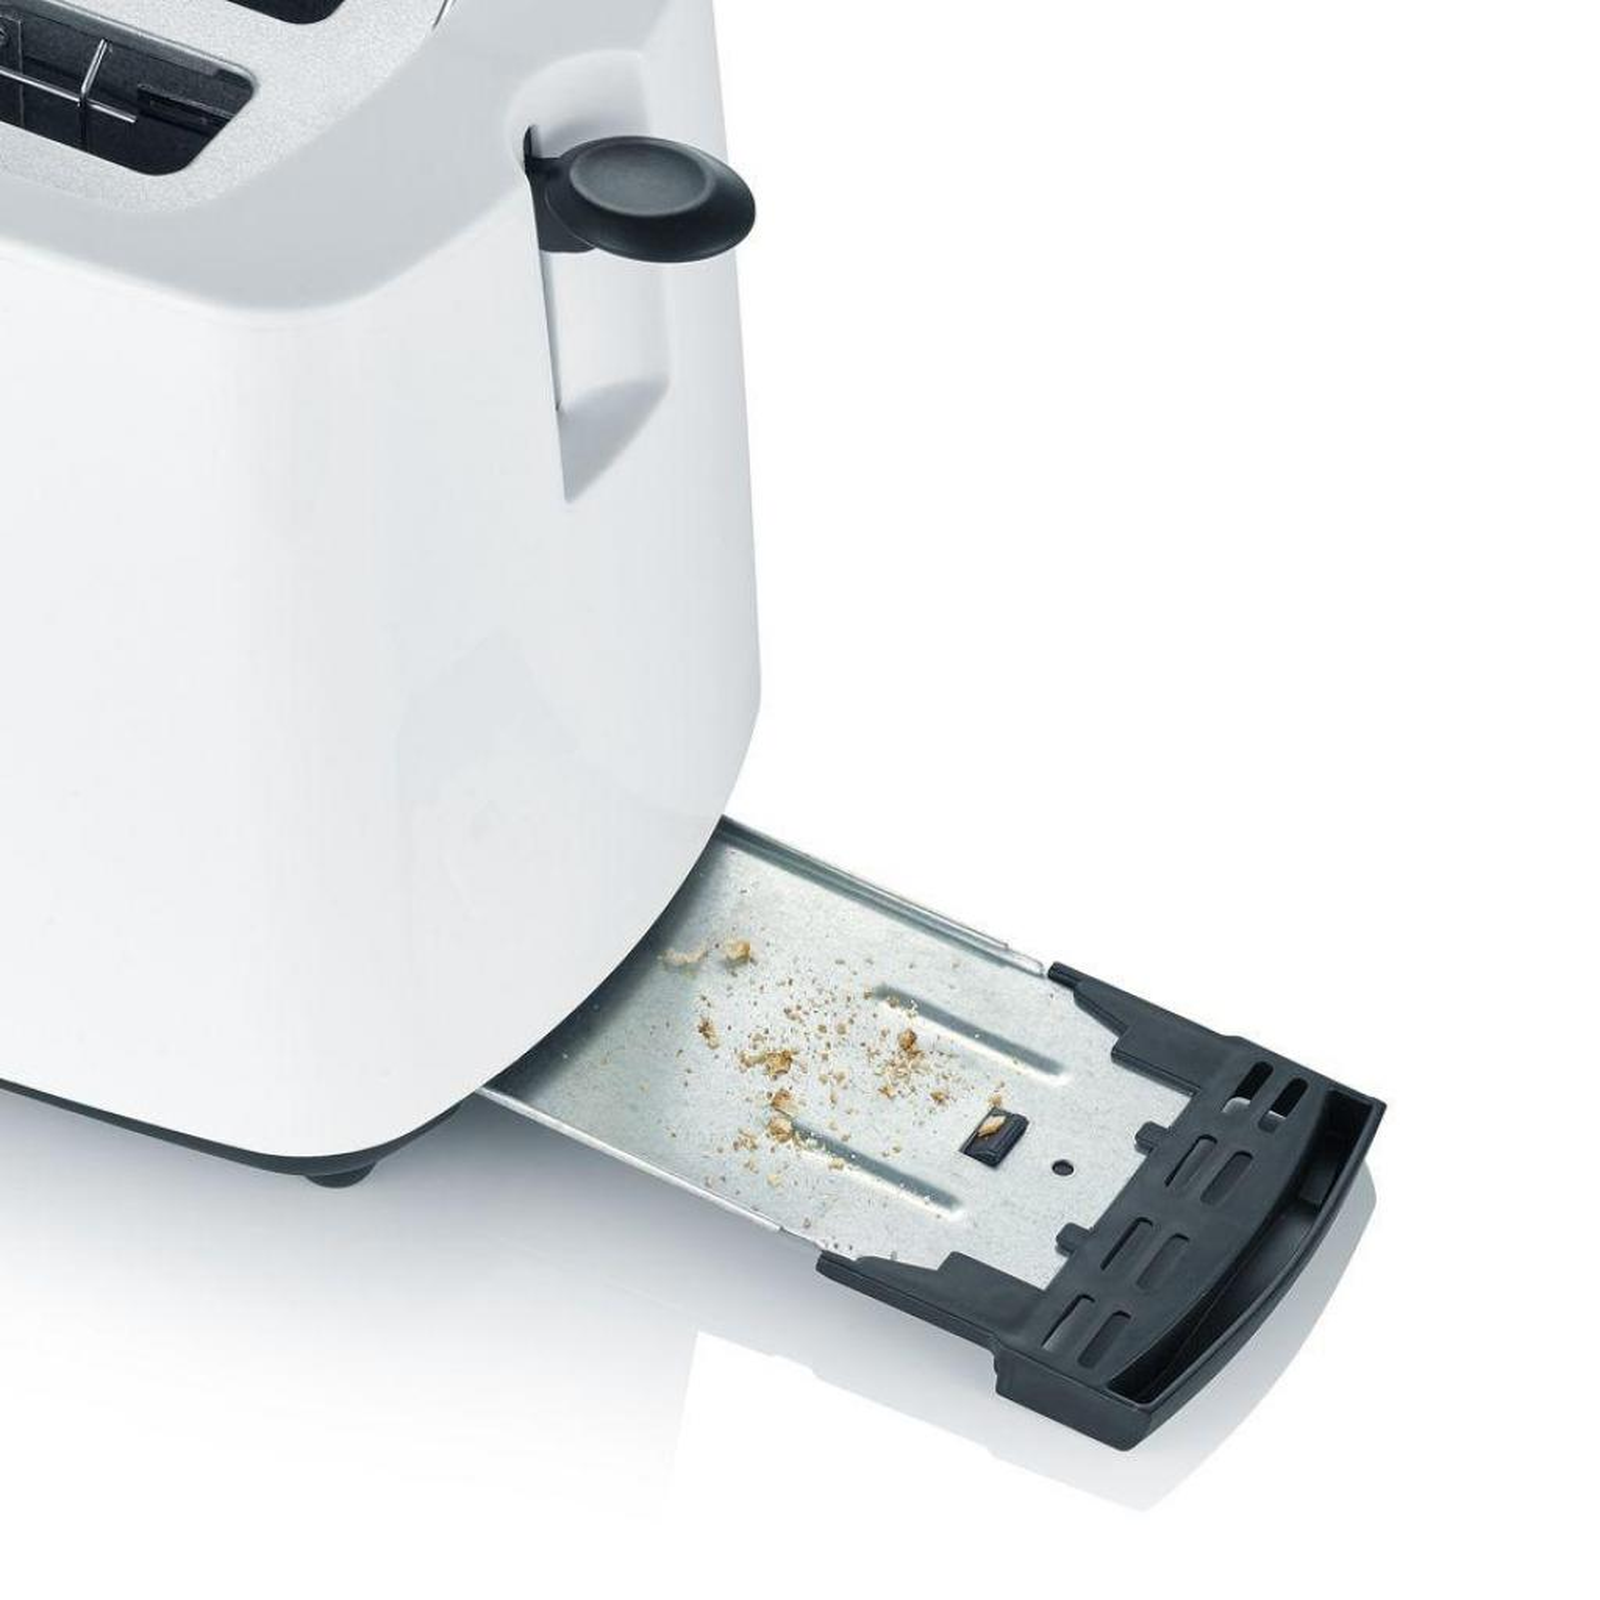 Тостер SEVERIN AT 2286 white изображение 5